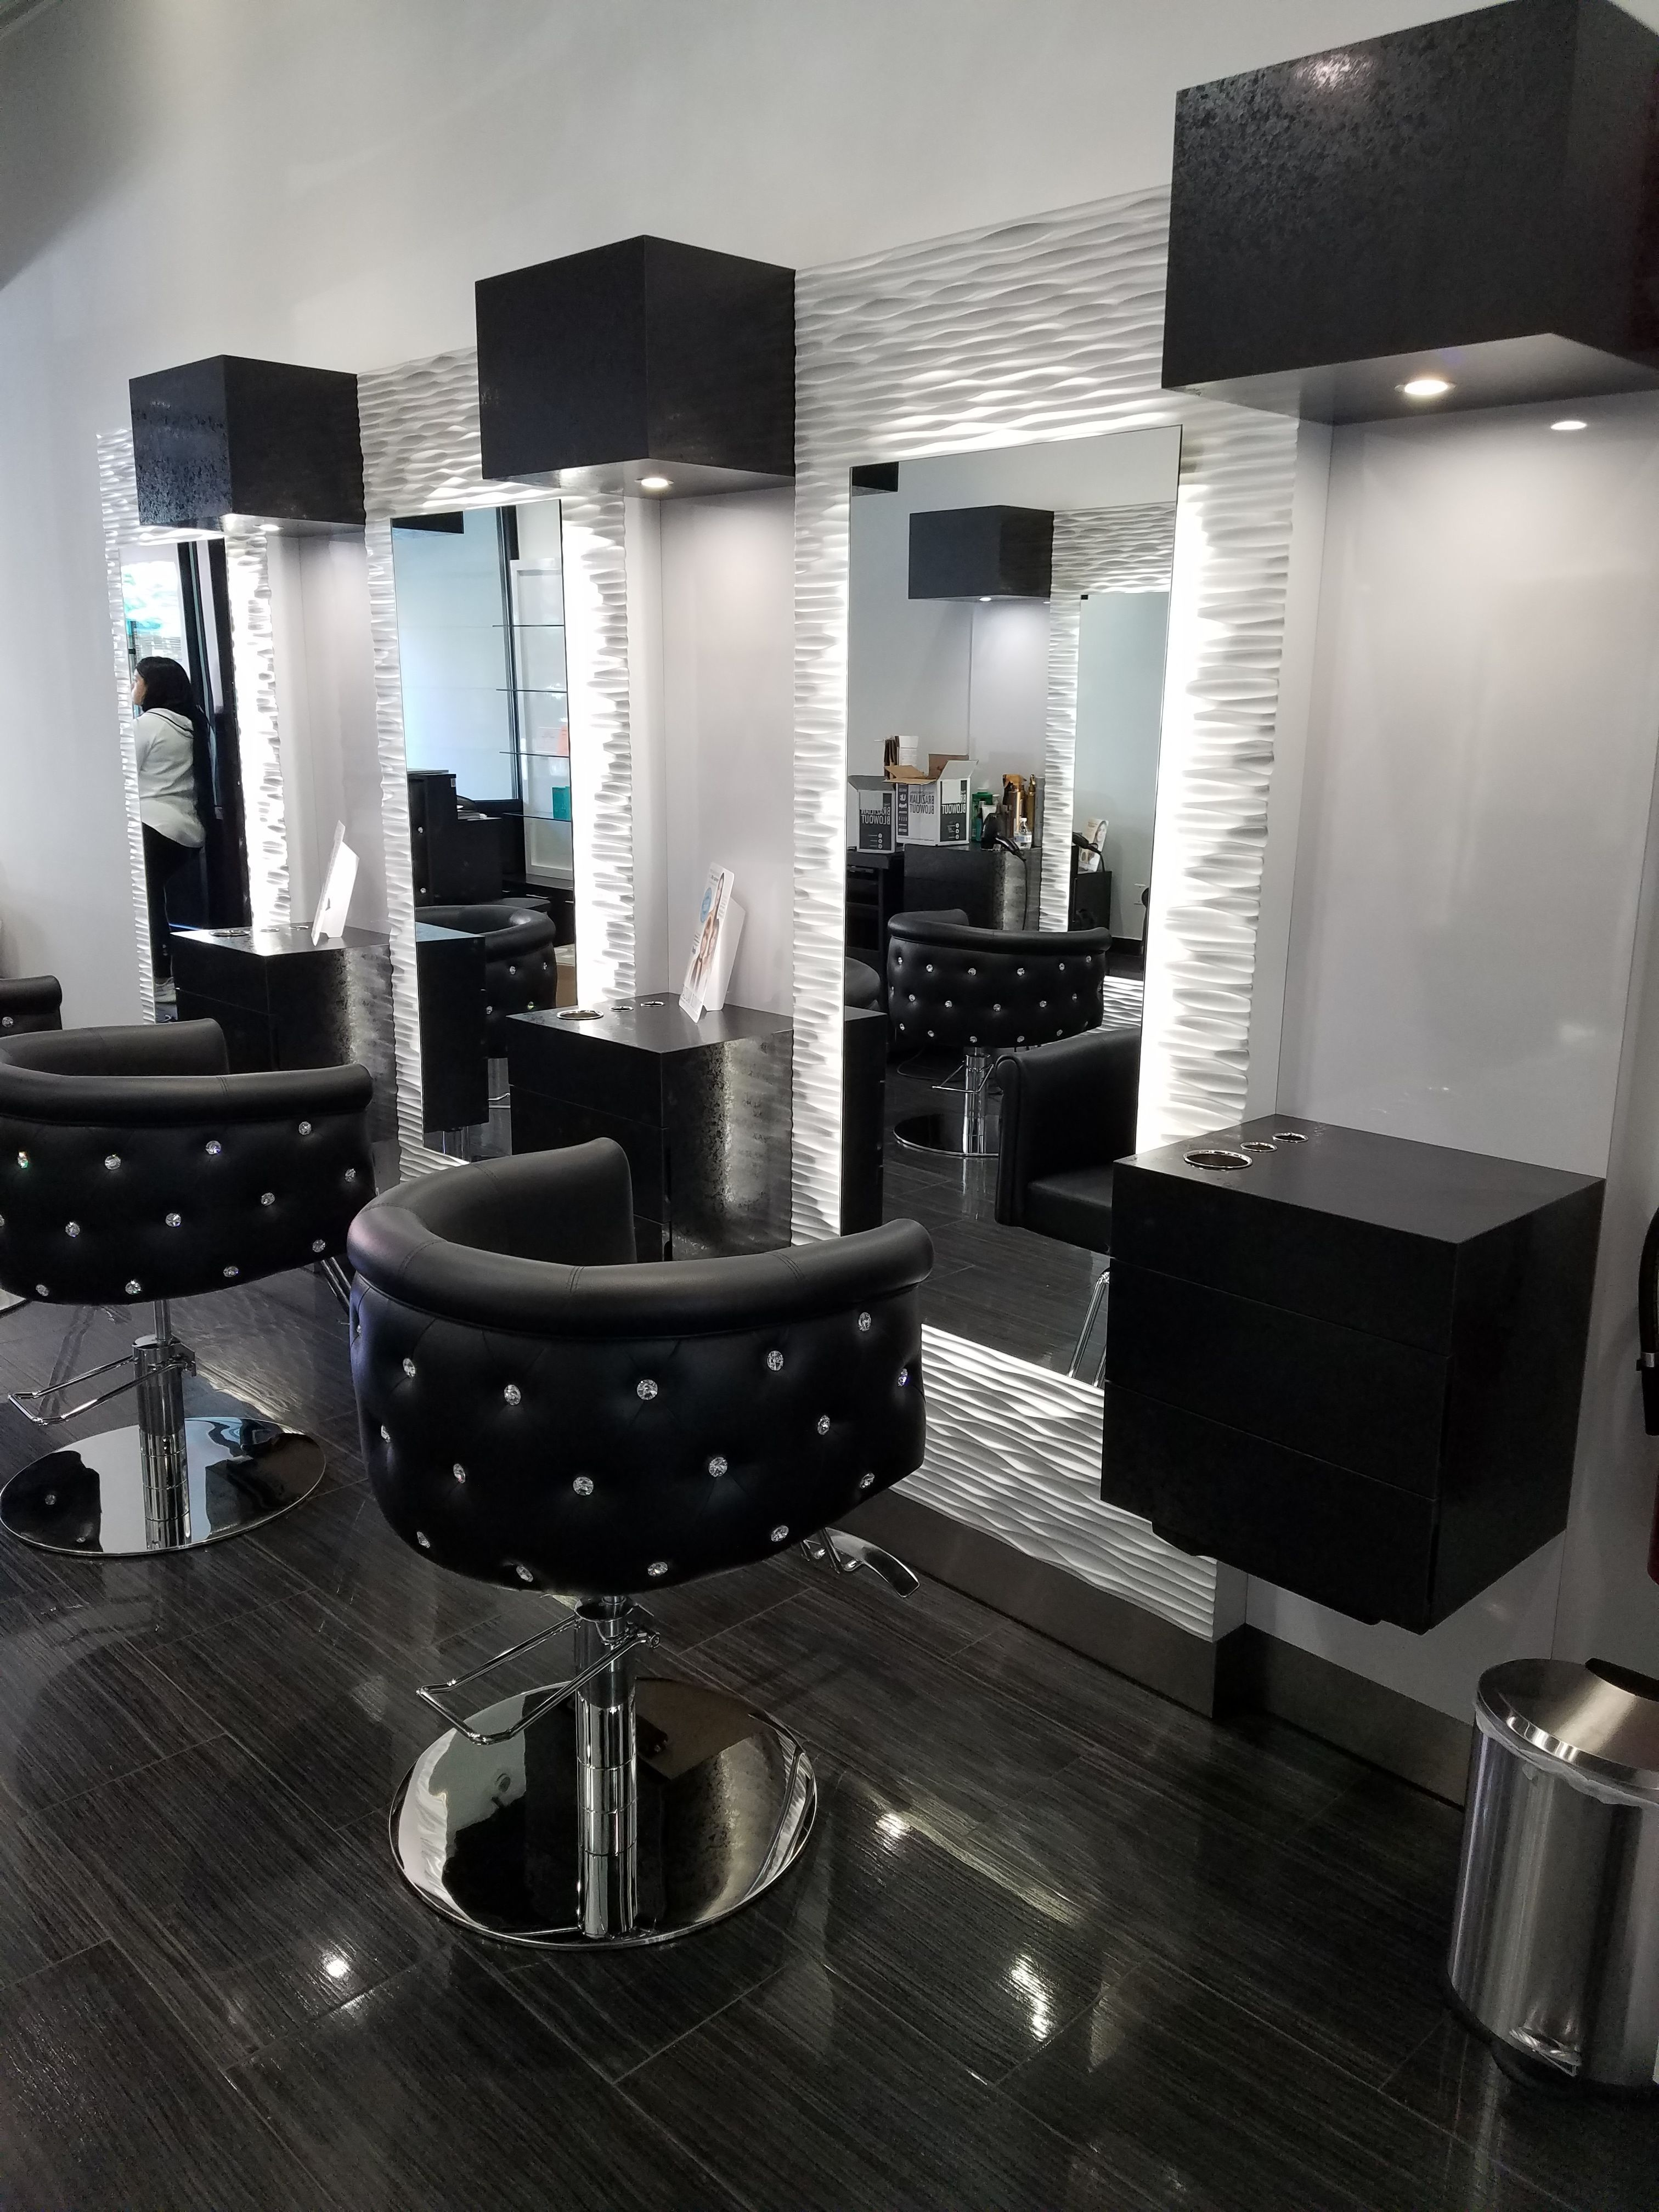 Canella Beauty Lounge Jackson Heights Ny Makeupsalonequipment Salon Furniture Salon Interior Design Salon Suites Decor